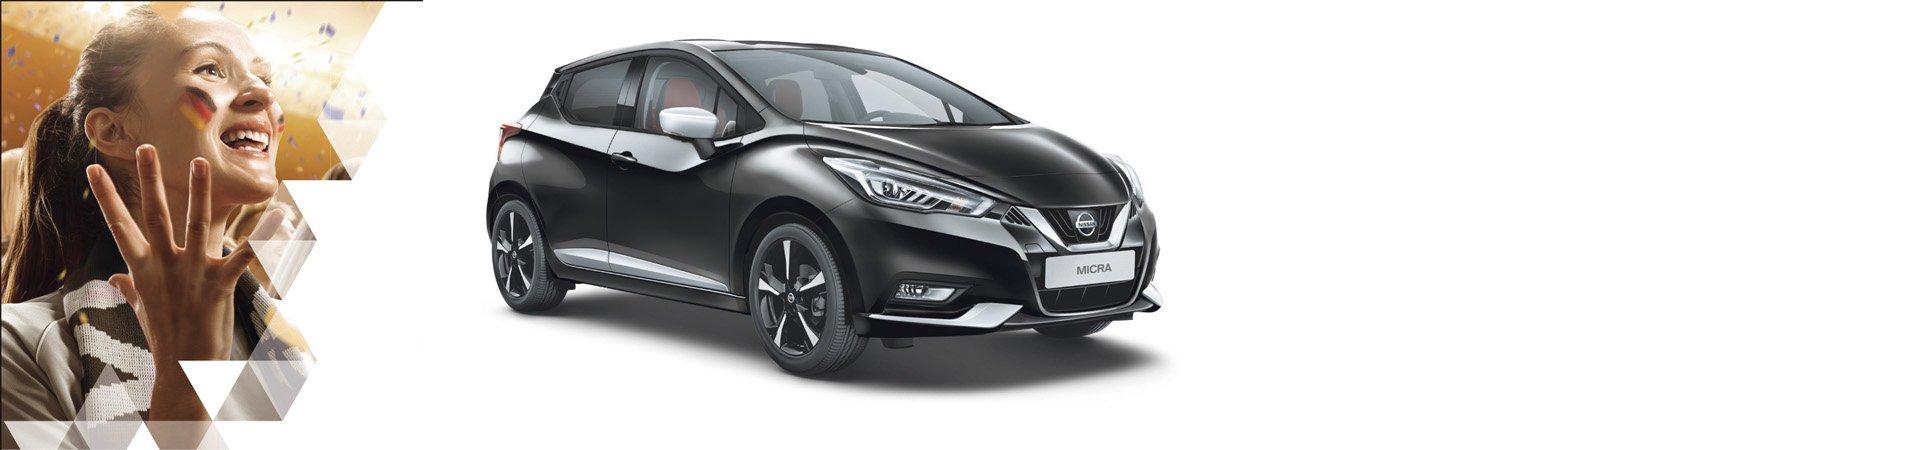 Nissan Micra Sondermodell 4You